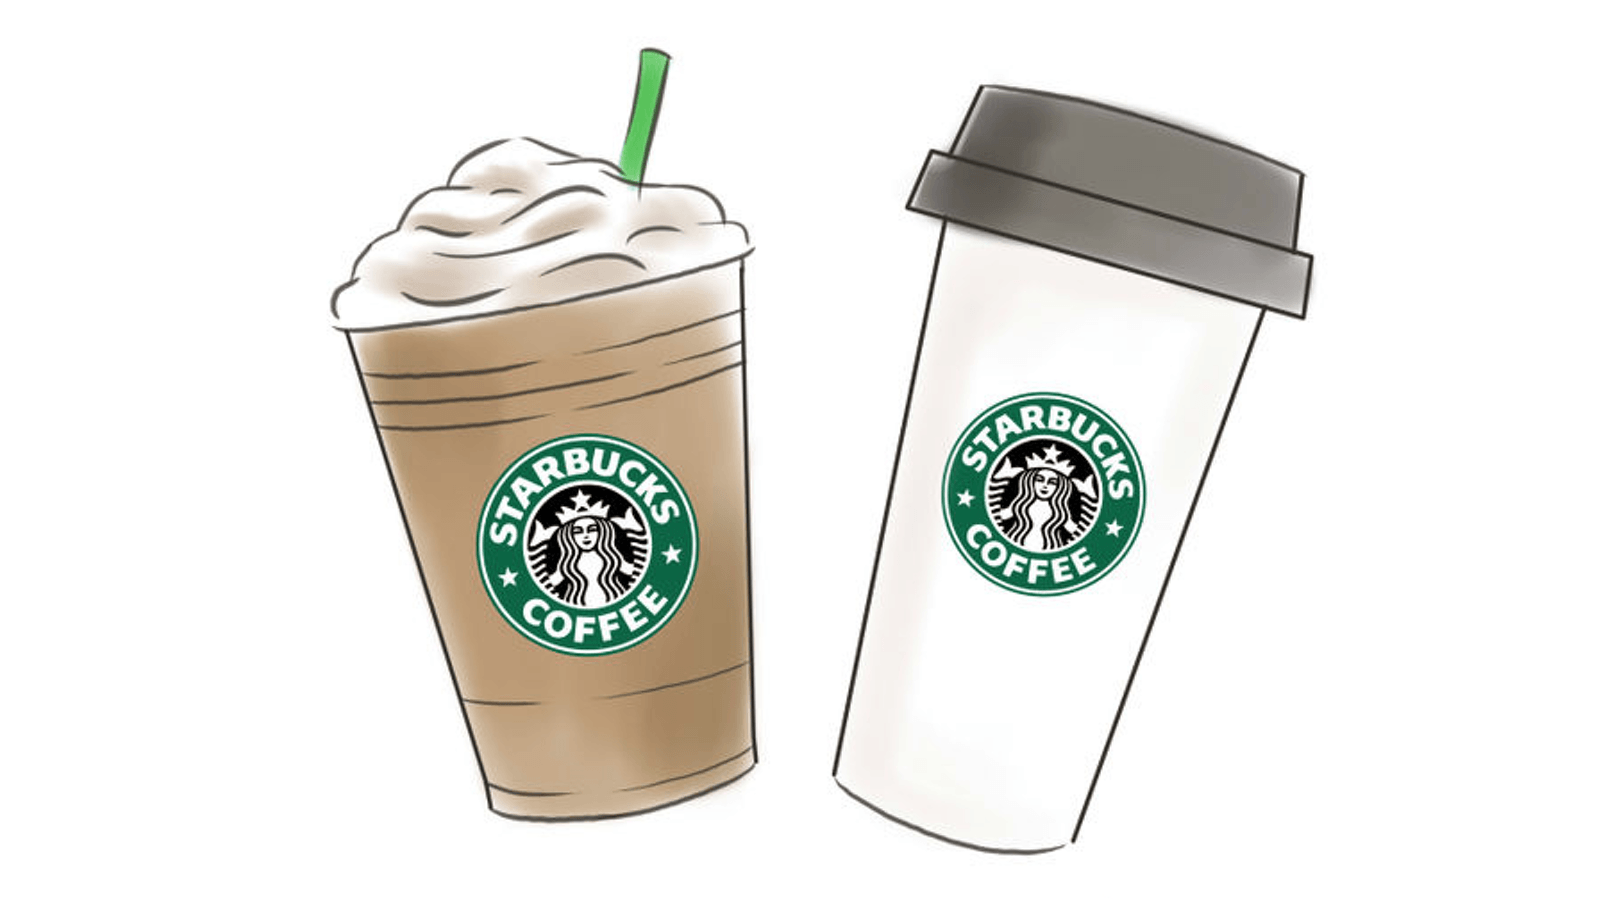 Ordering At Starbucks A Guide To Starbucks Lingo Vamers